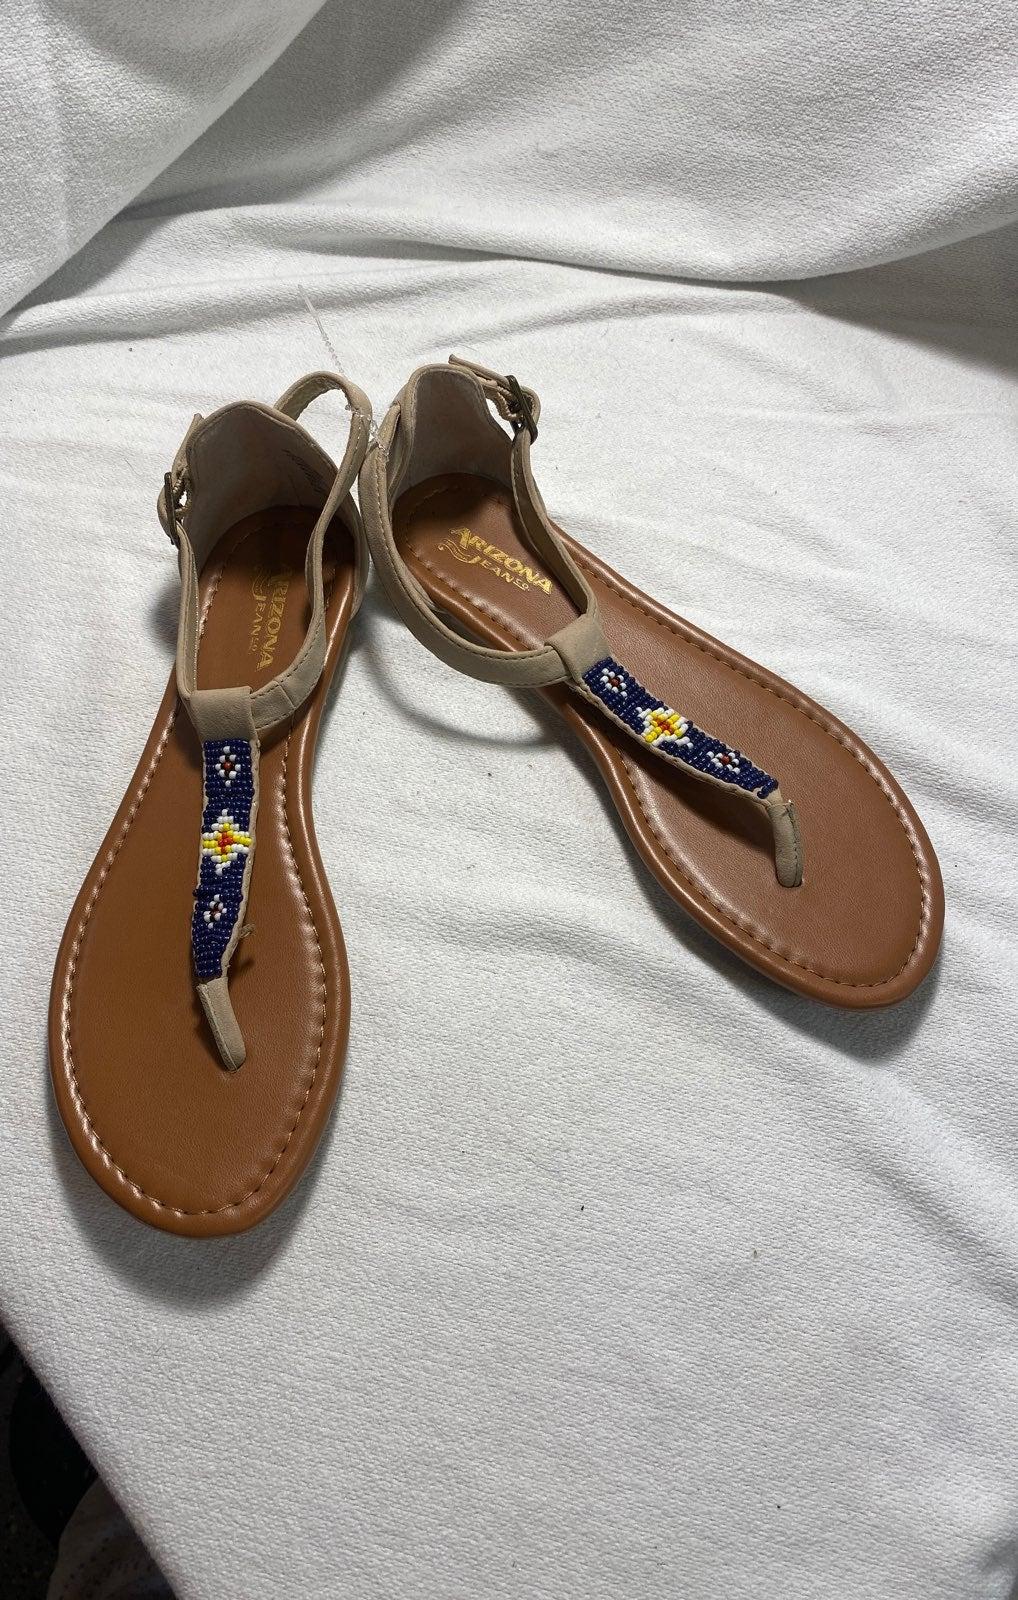 Arizona Beaded tan sandals New size 7